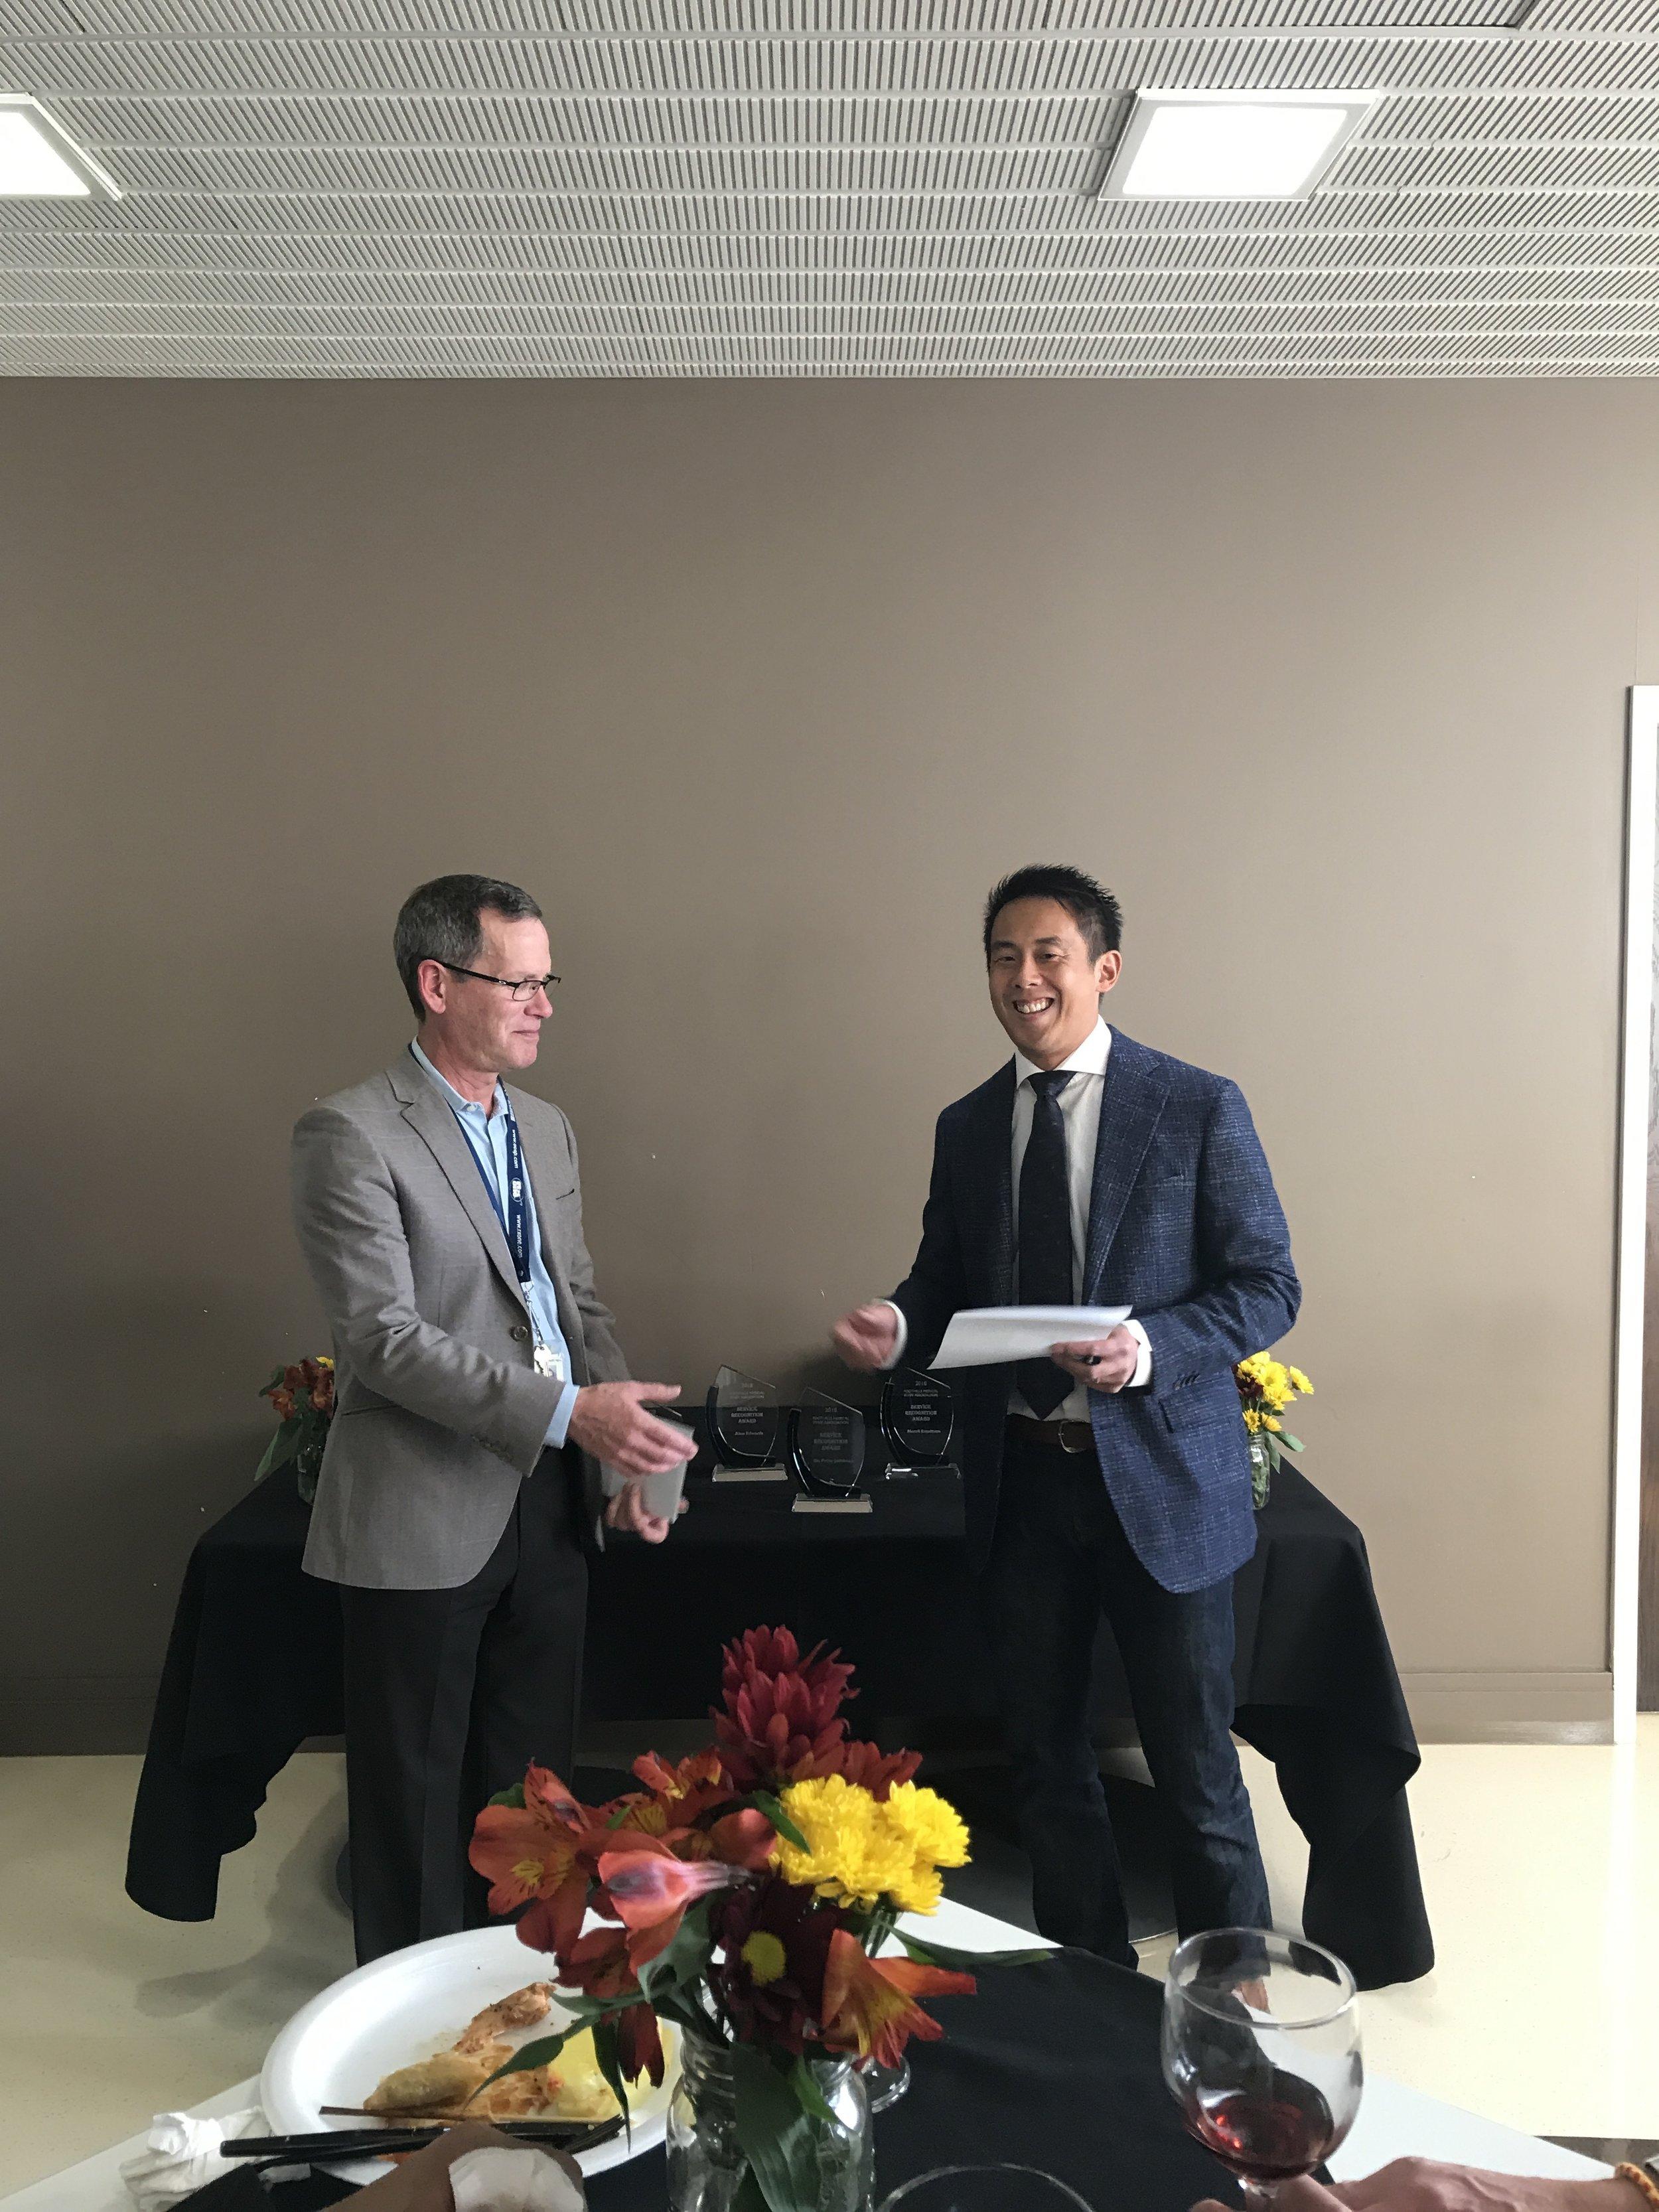 Dr. Joel Fox & Dr. Trevor Chan